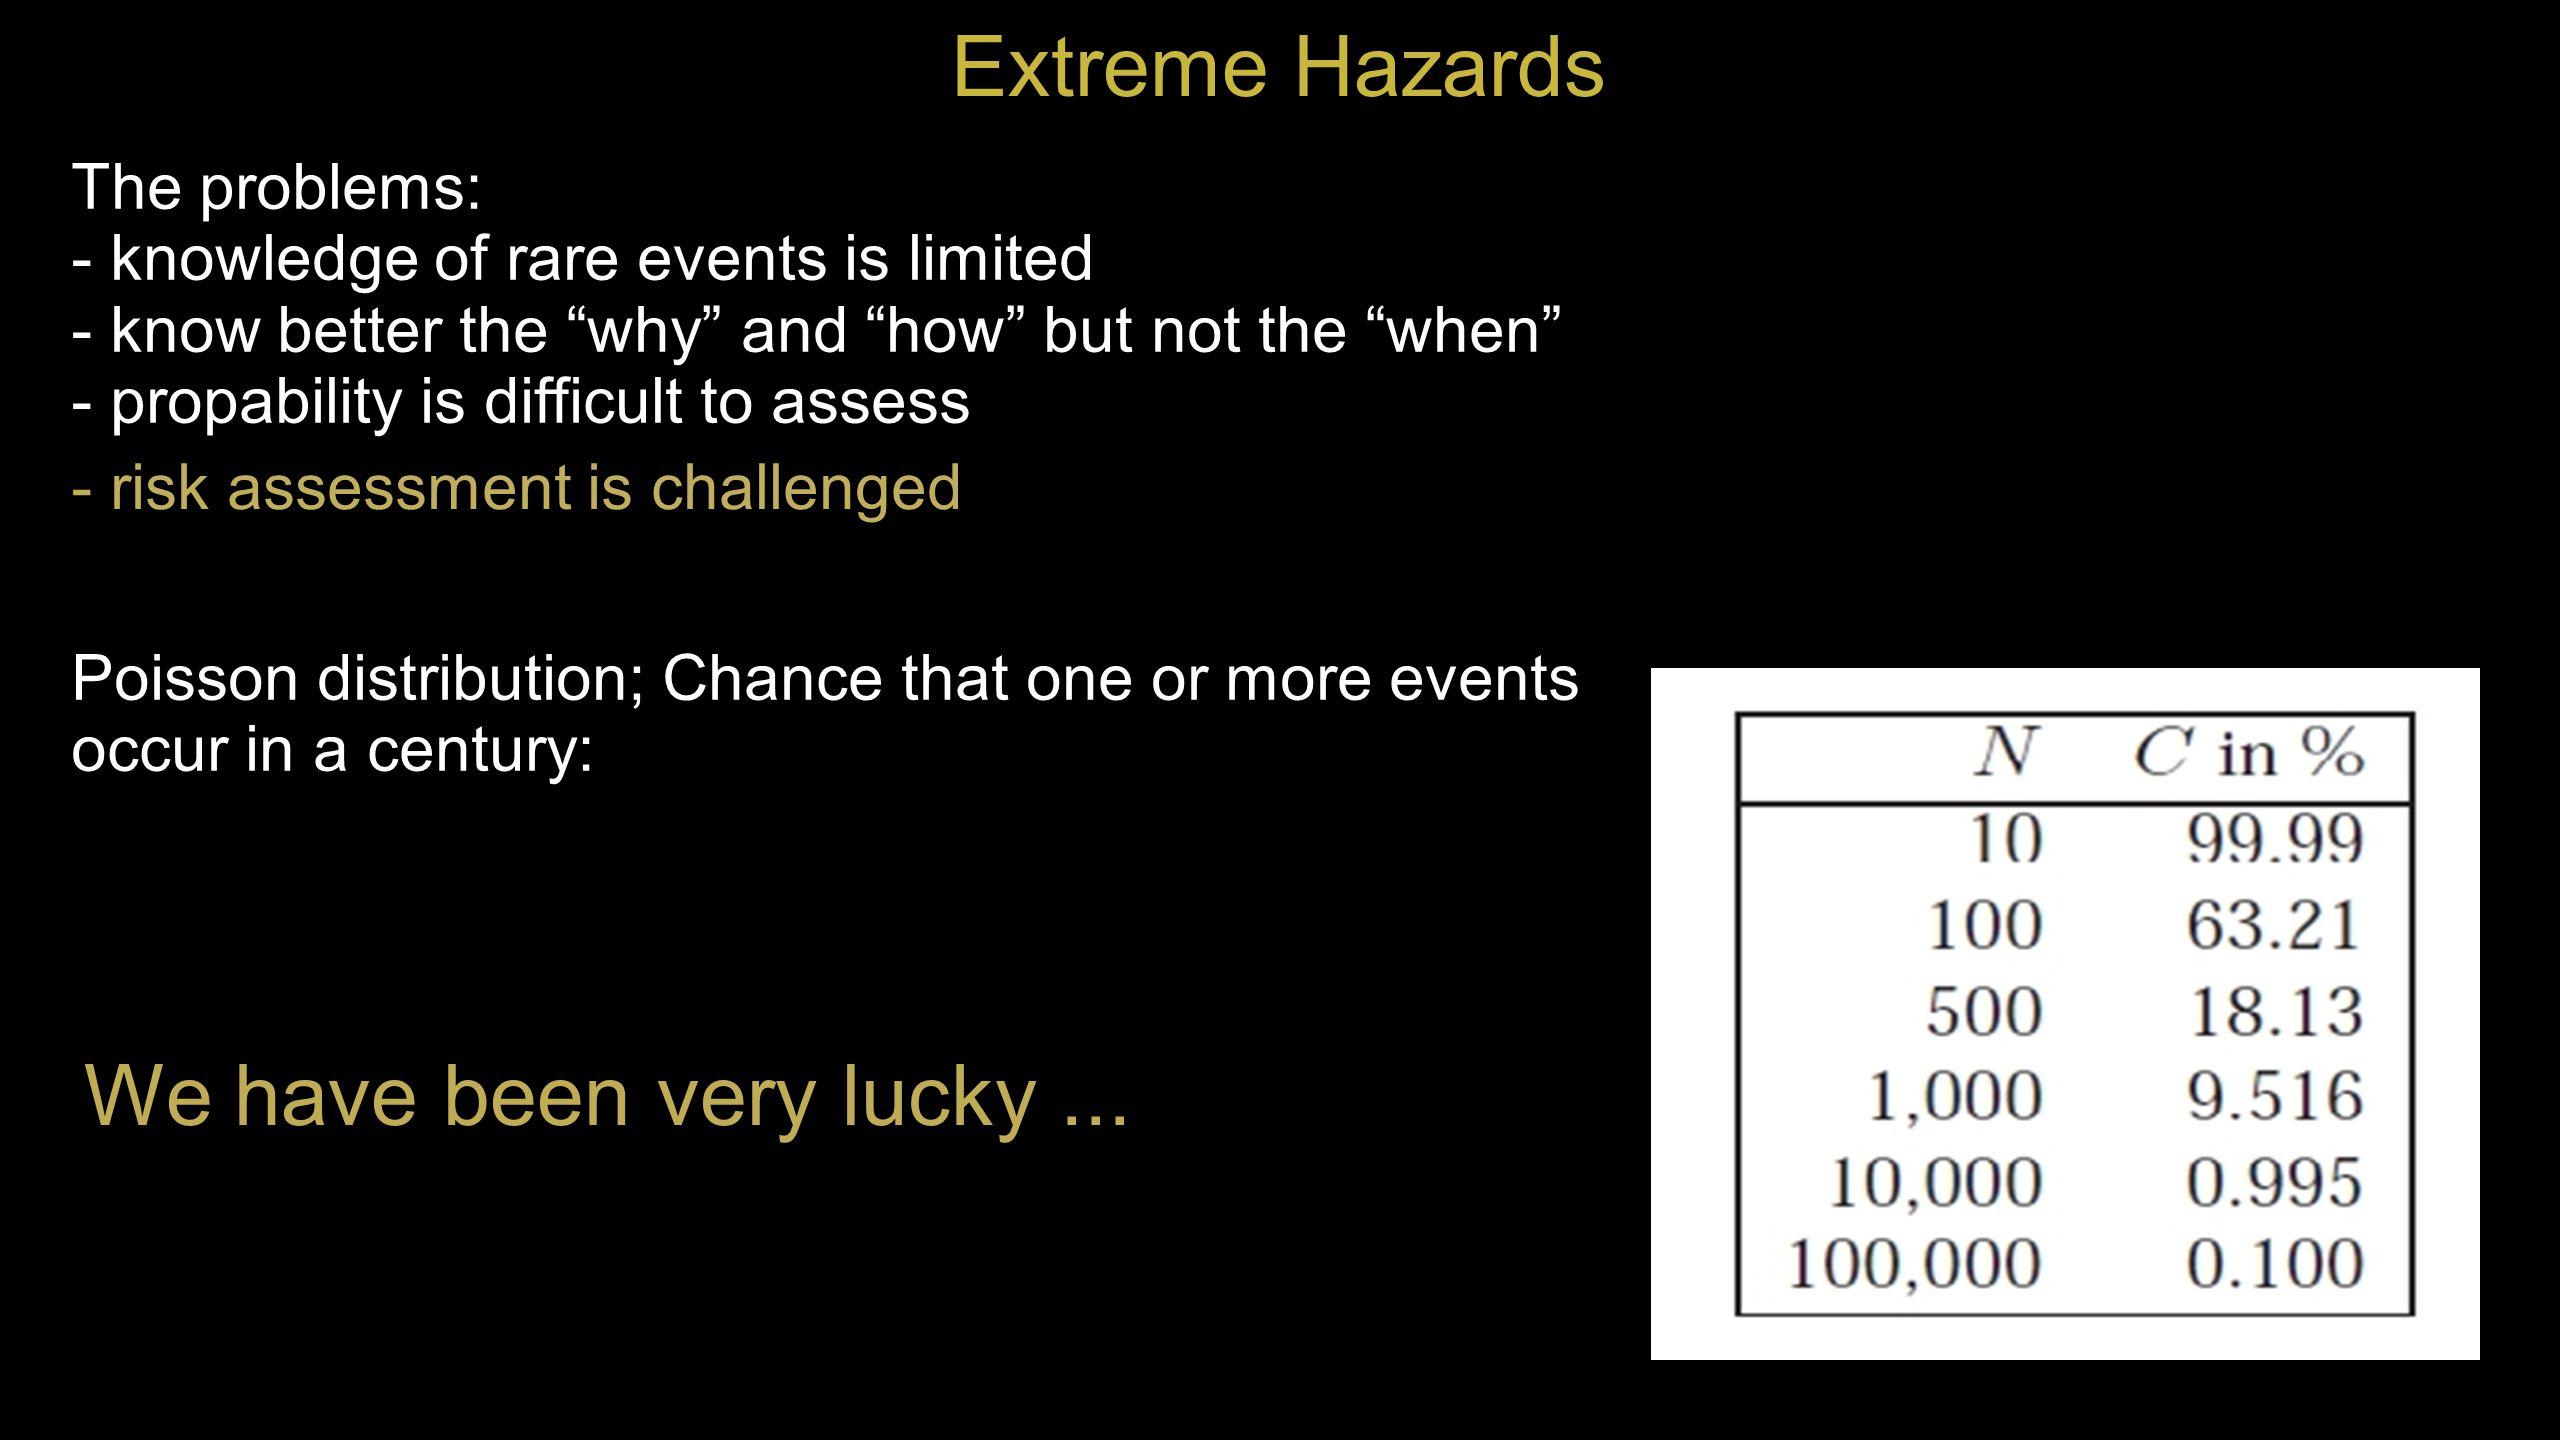 - landslides - tsunamis - earthquakes - volcanic eruptions Extreme Geohazards